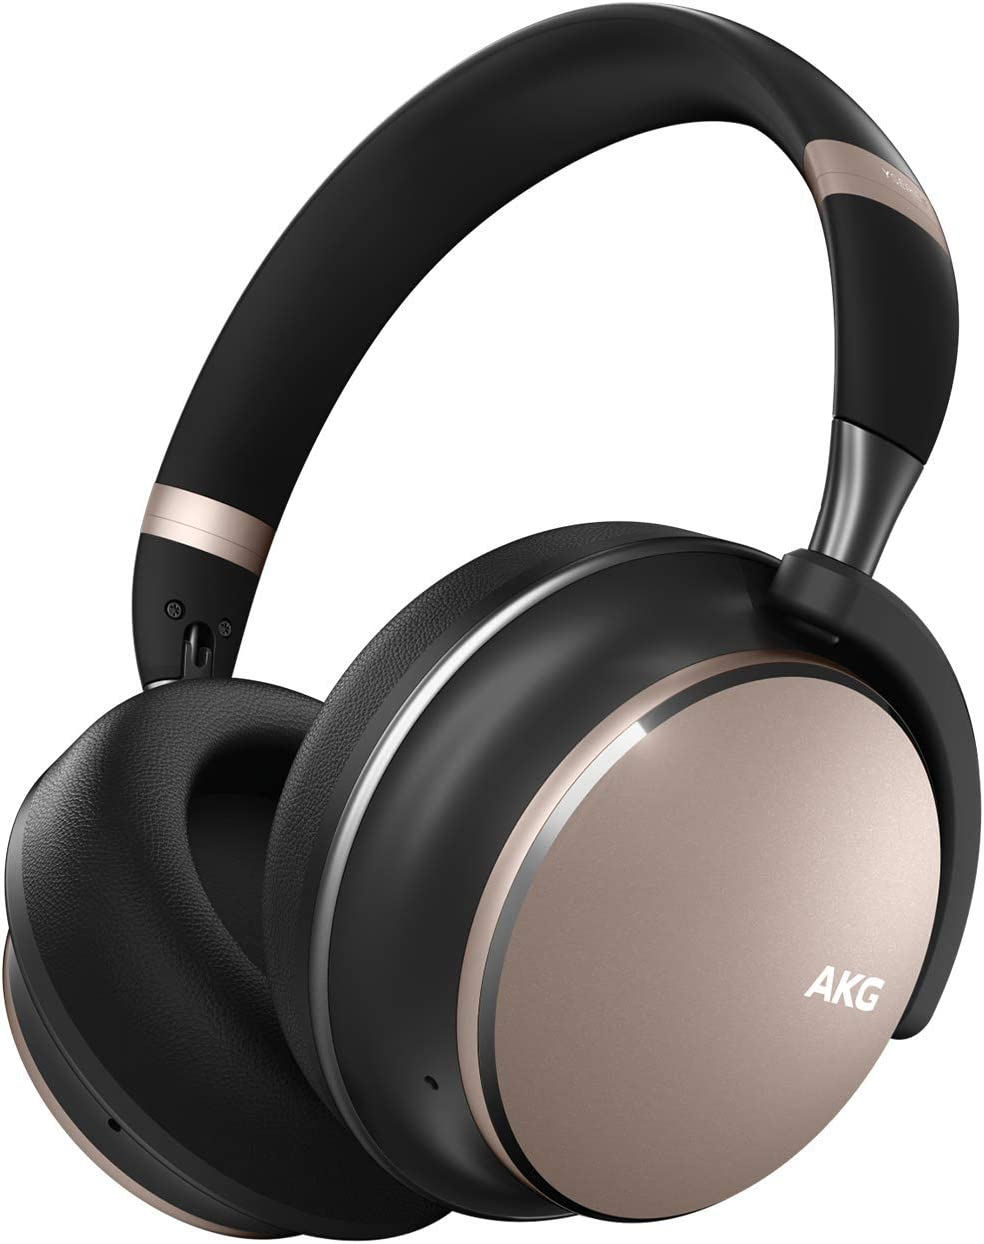 【AKG公式ストア】 AKG Y600NC WIRELESS ノイズキャンセリング ワイヤレスヘッドホン Bluetooth 5.0 SBC/AAC対応 最大約35時間再生 オリジナルステッカー付き AKGY600NCBT-E (ベージュ)